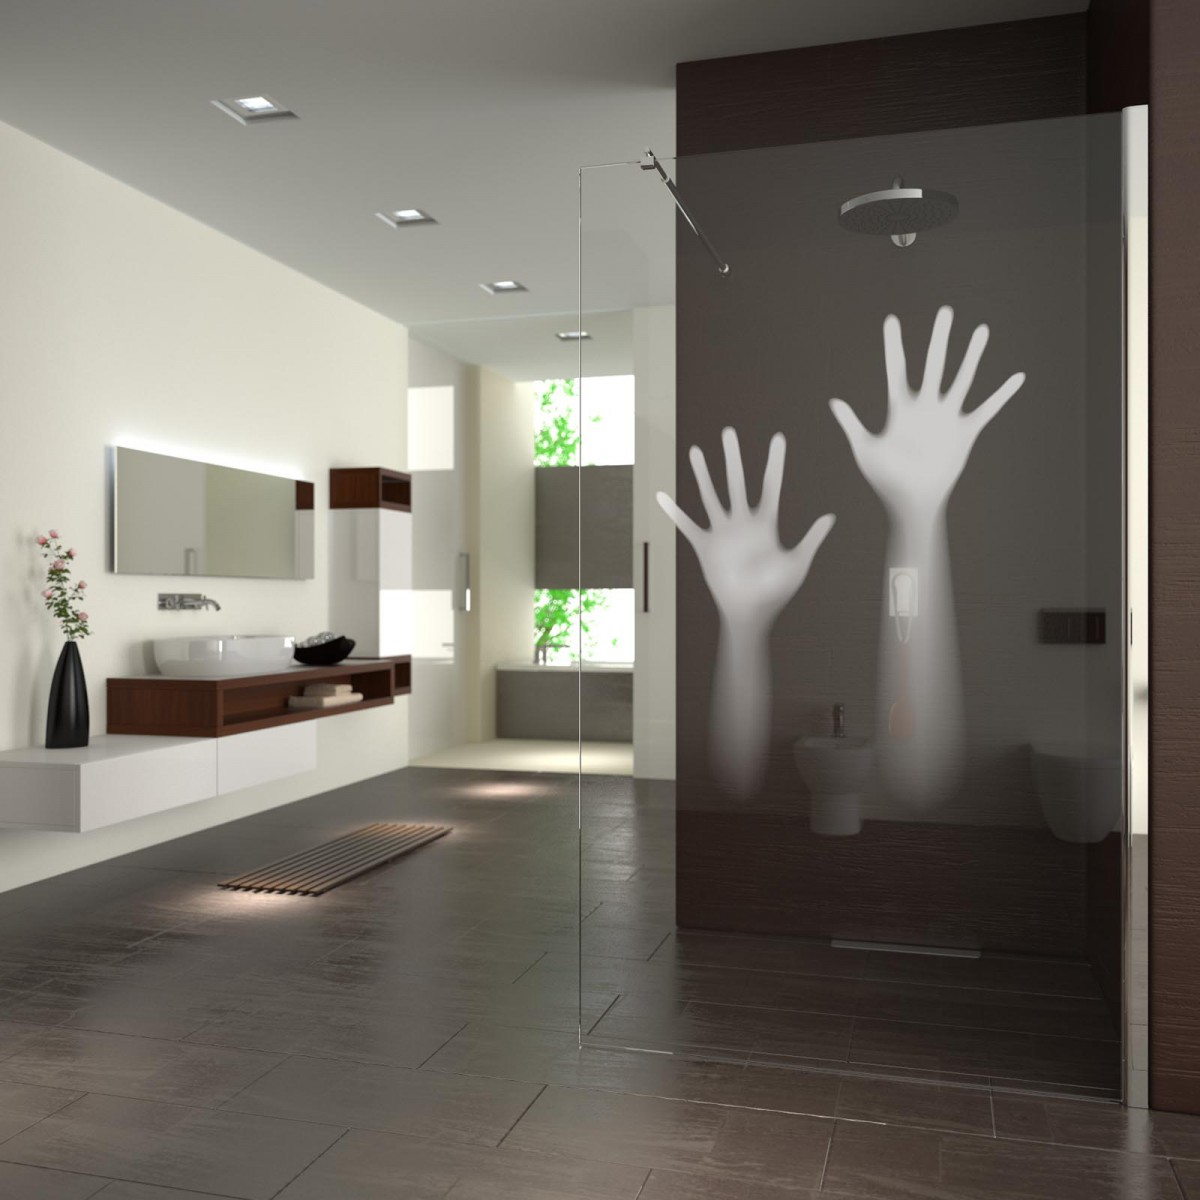 walk in dusche emsdetten 989704997. Black Bedroom Furniture Sets. Home Design Ideas